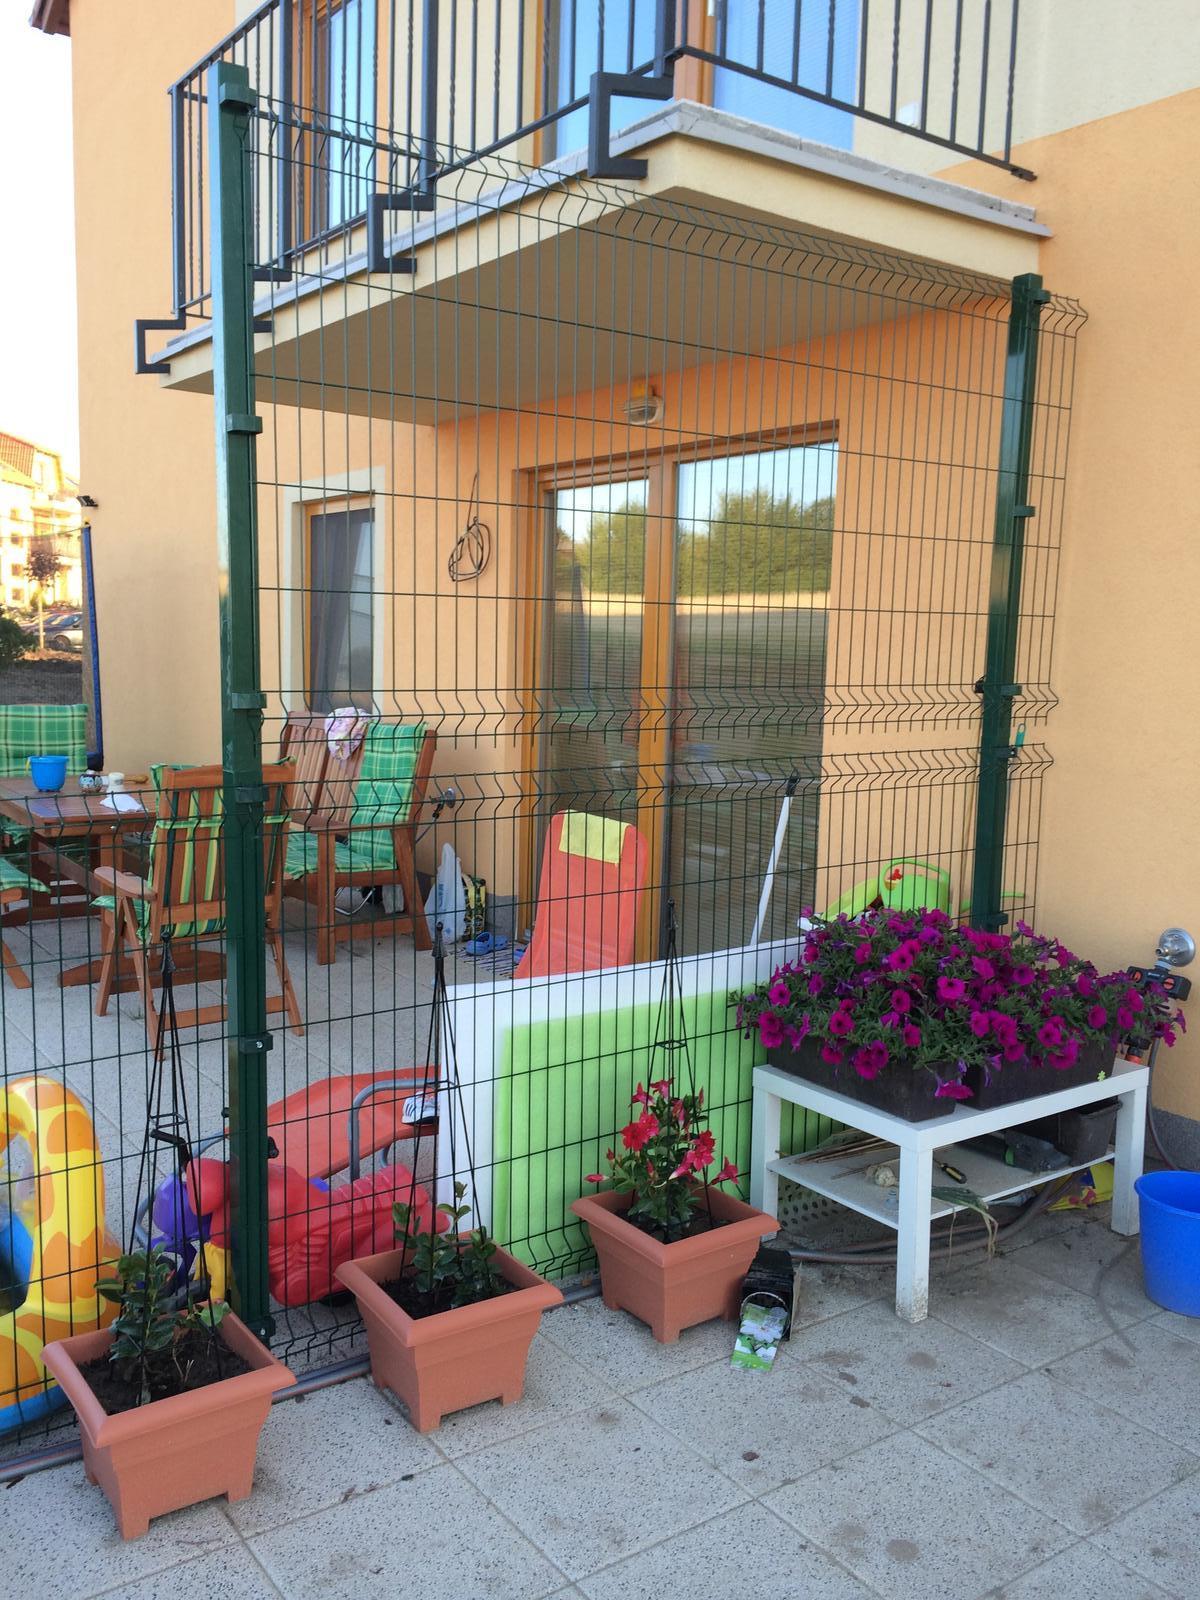 Zahrada- jak to vsechno zacalo.. - Sousedi zacali stavet rozdeleni teras.. Napada nekoho cim to odstinit?